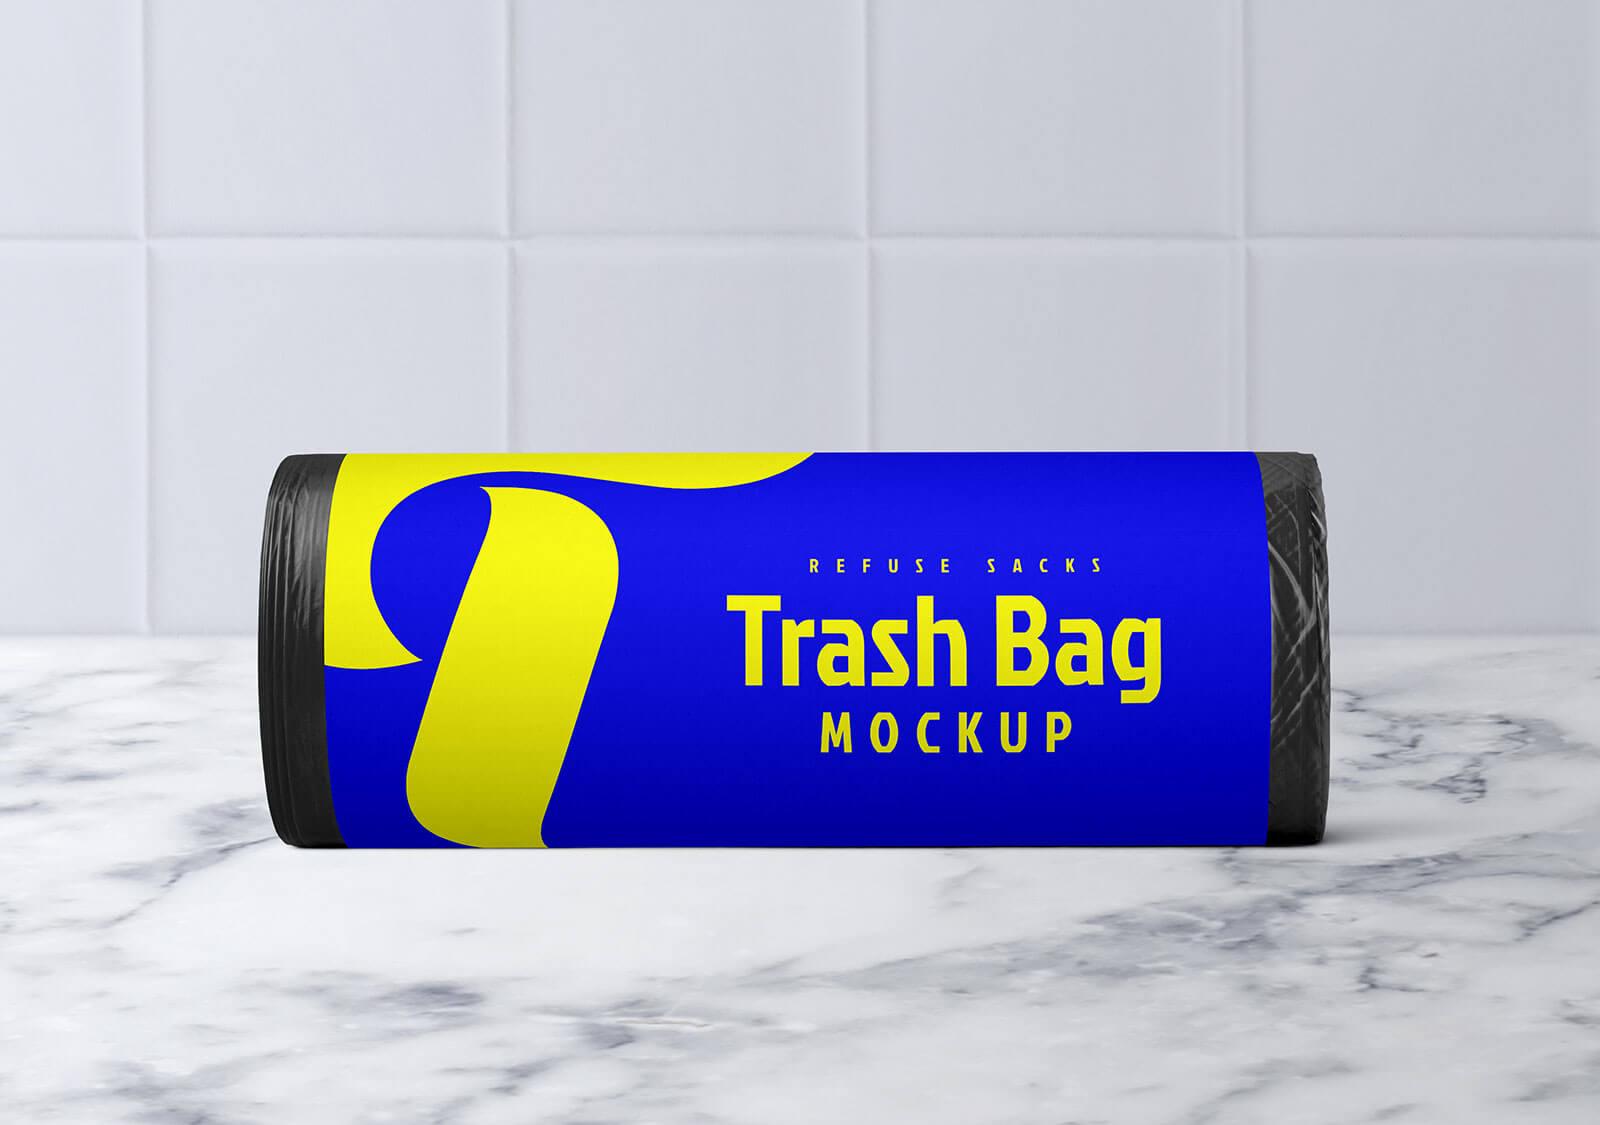 Free-Refuse-Sacks-Garbage-Trash-Bin-Bag-Mockup-PSD-Set